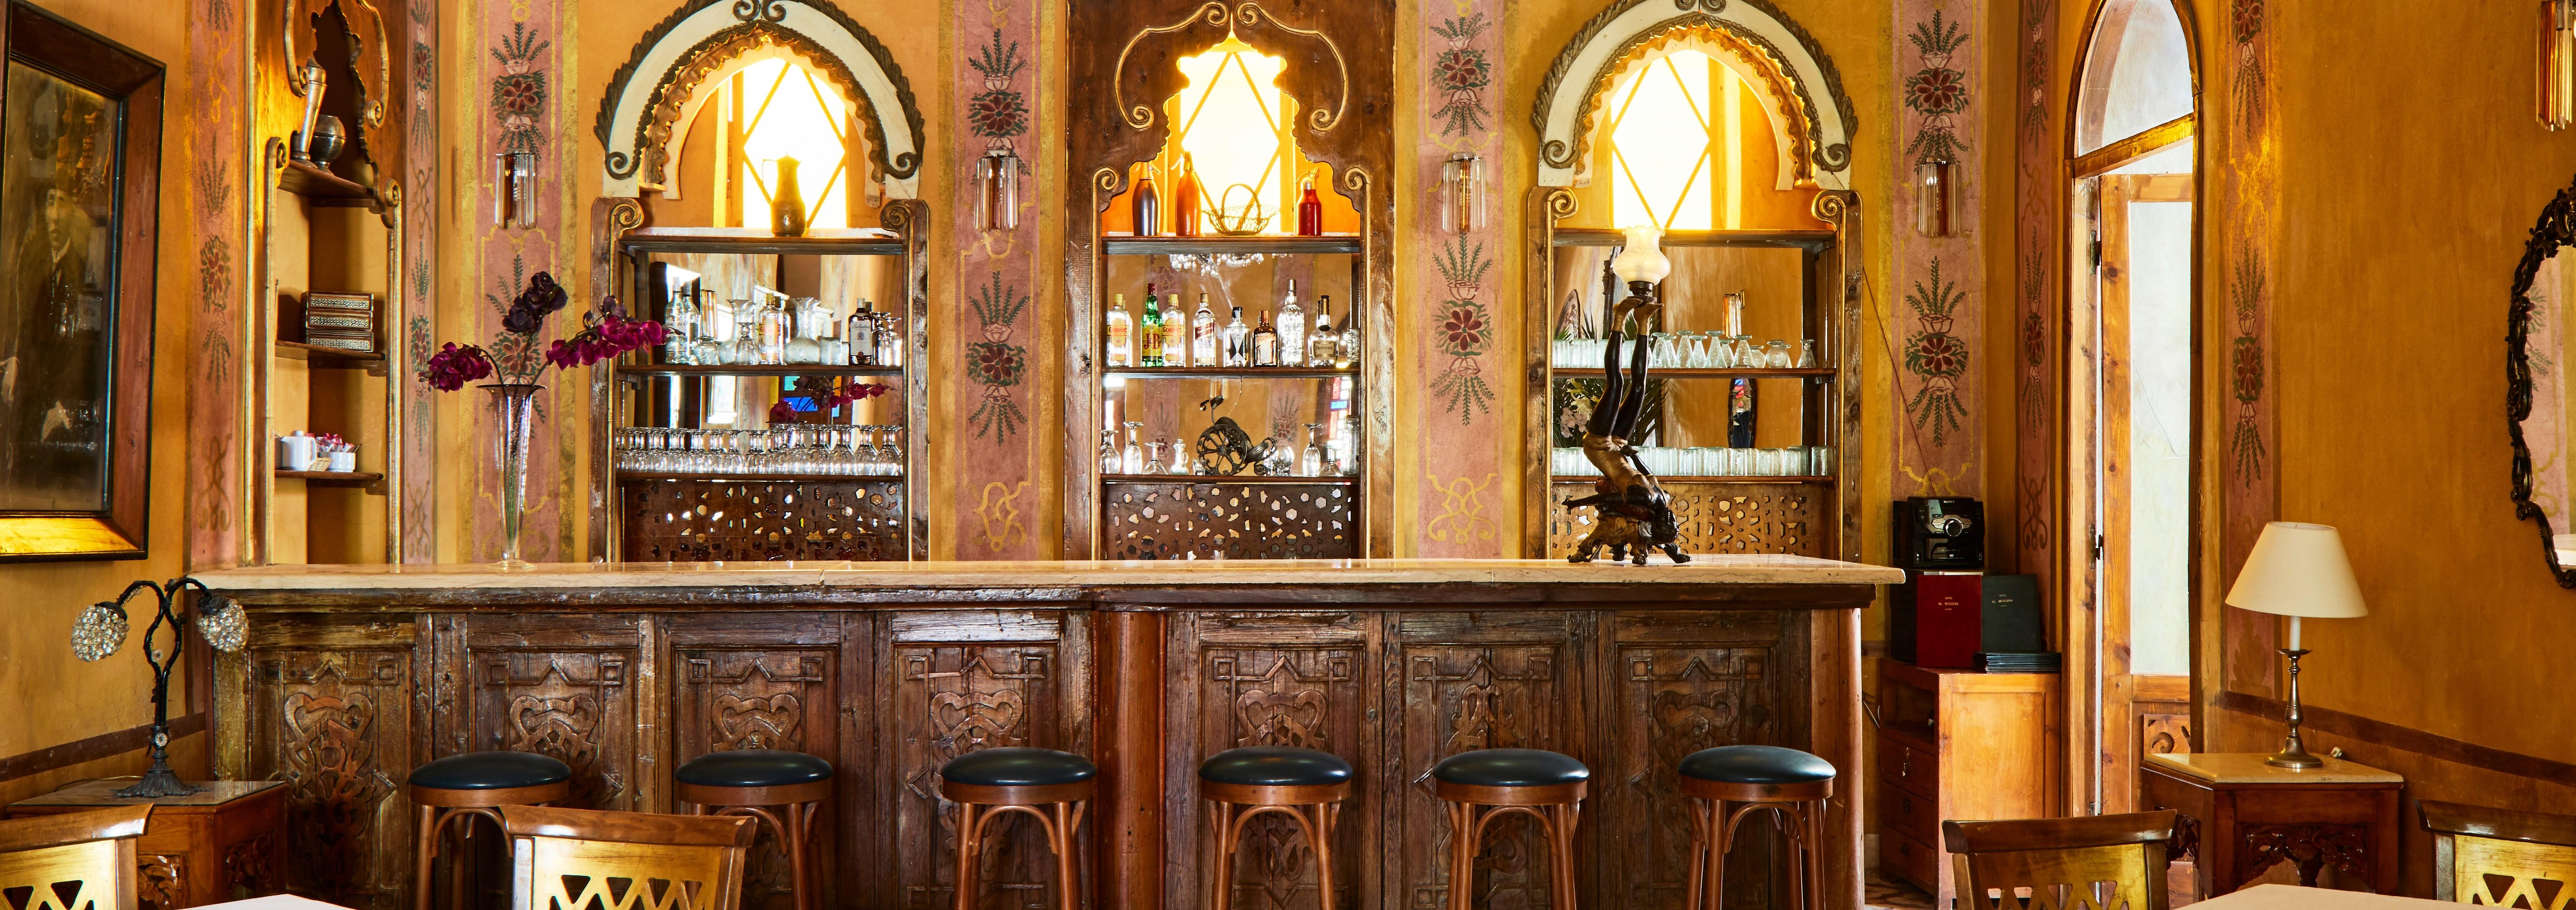 al-moudira-hotel-bar